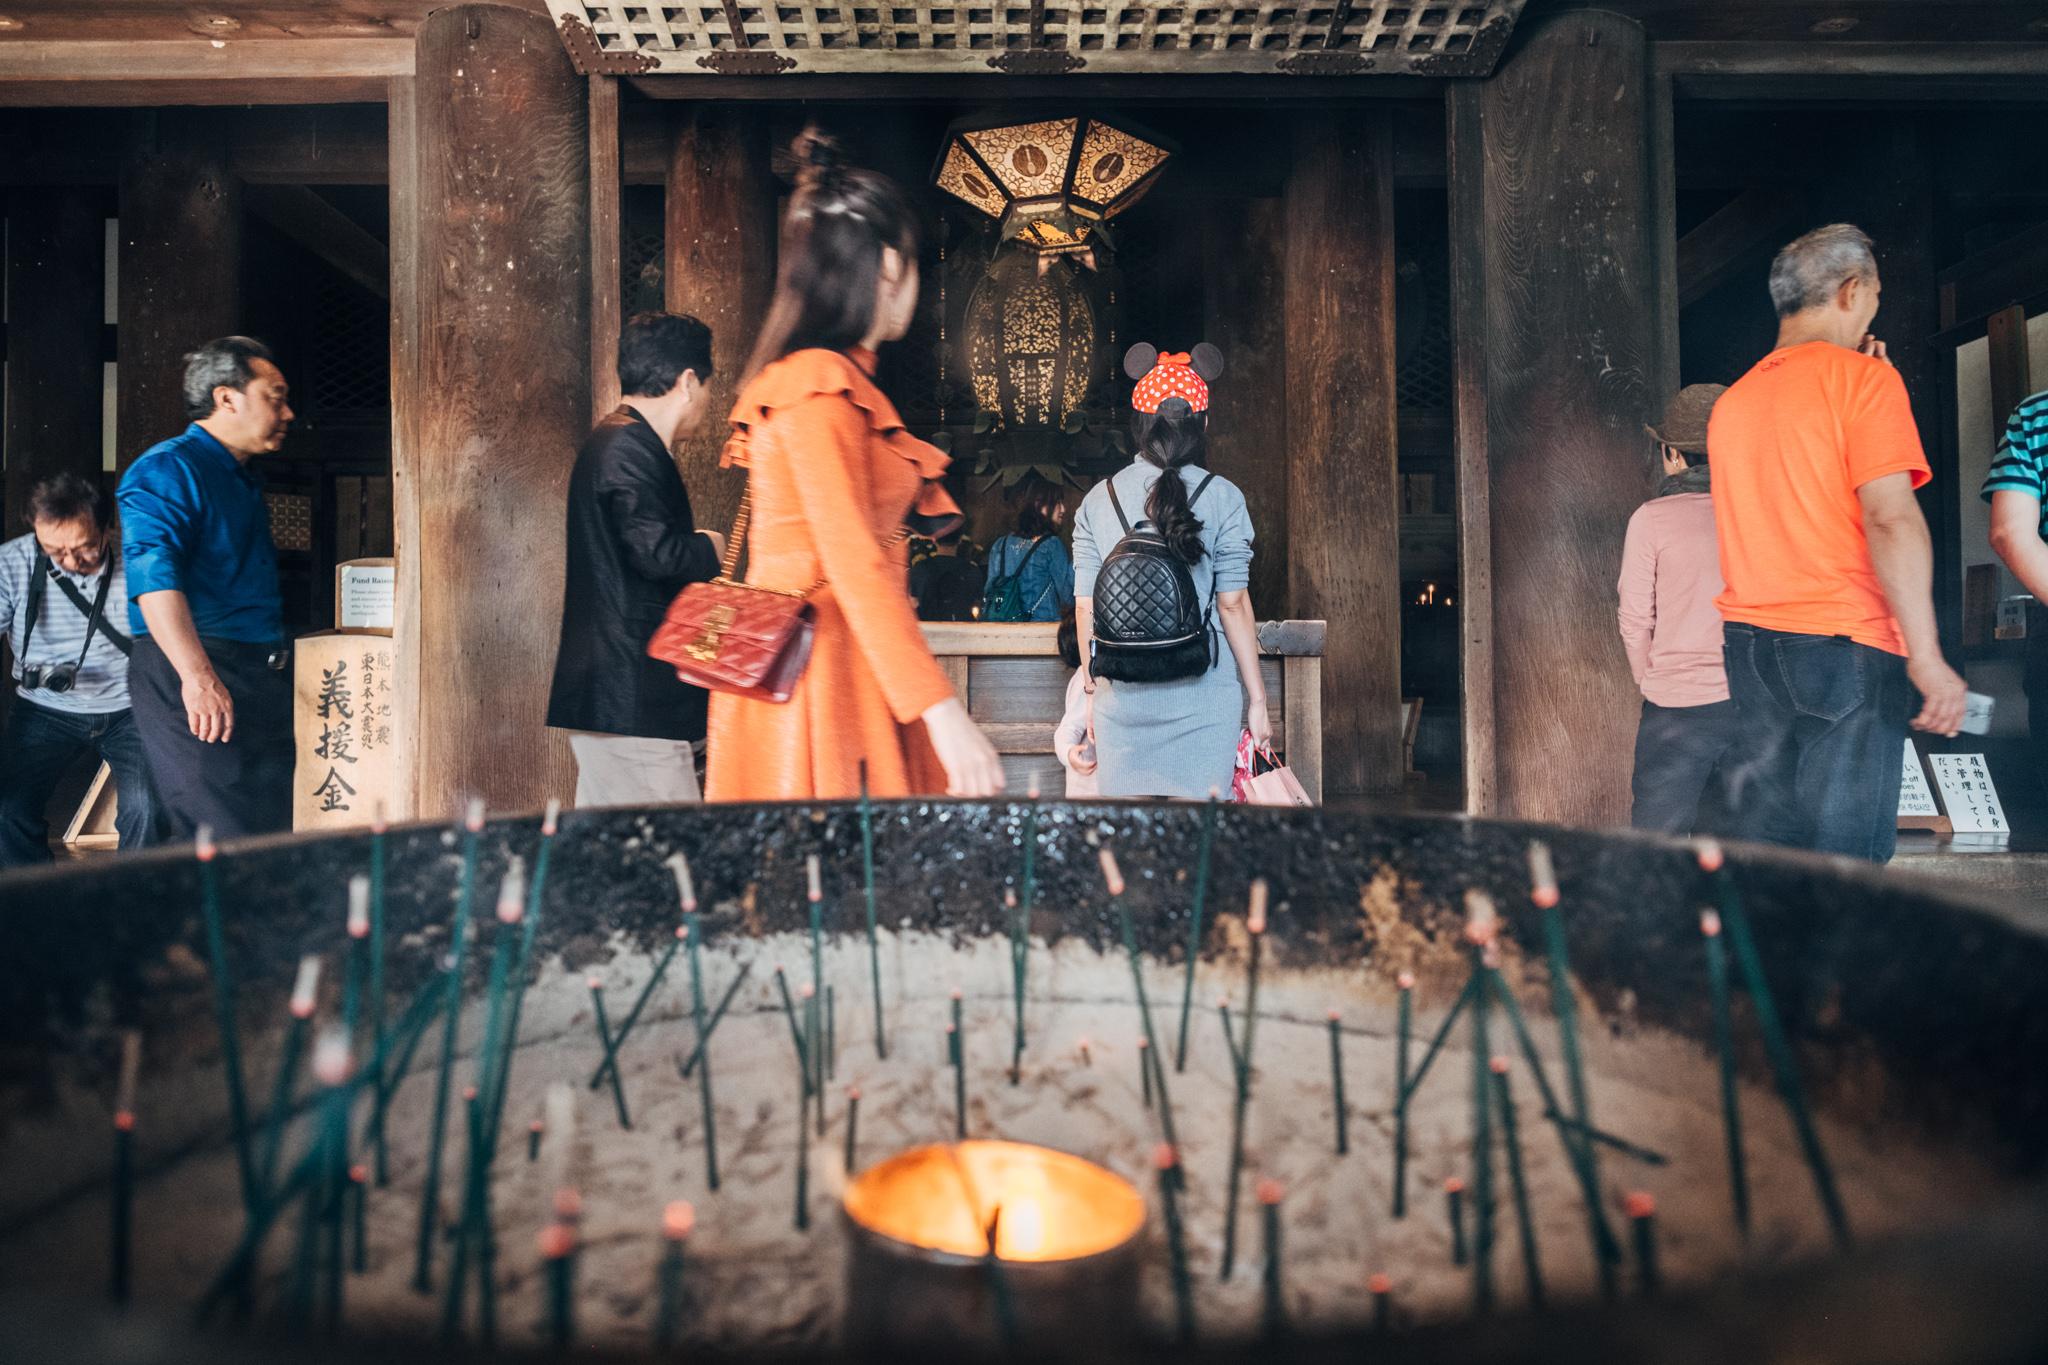 清水寺 – Inside Kiyomizu-dera, Kyoto